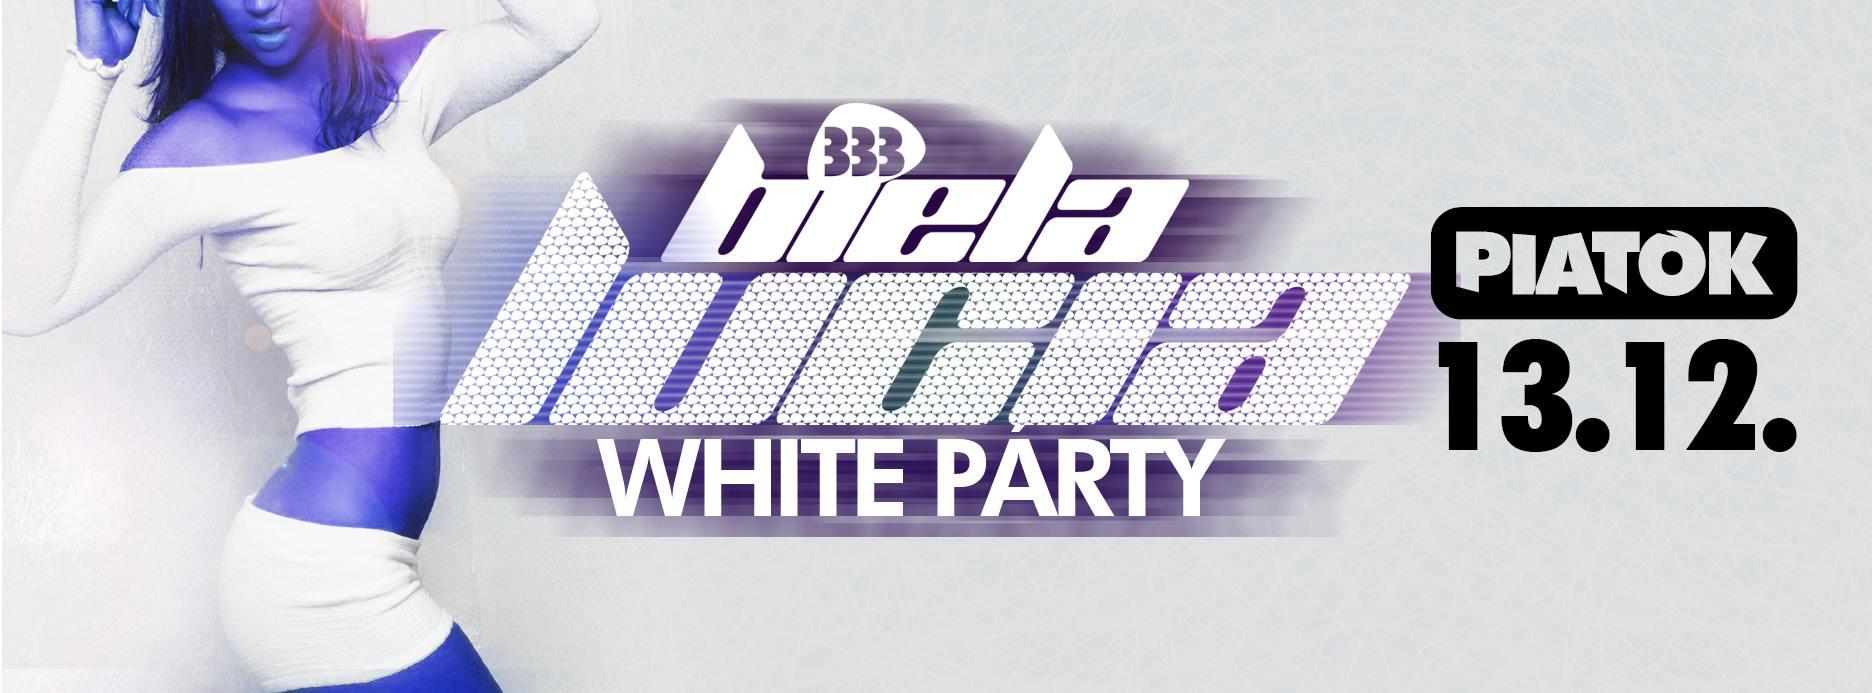 BIELA LUCIA white párty